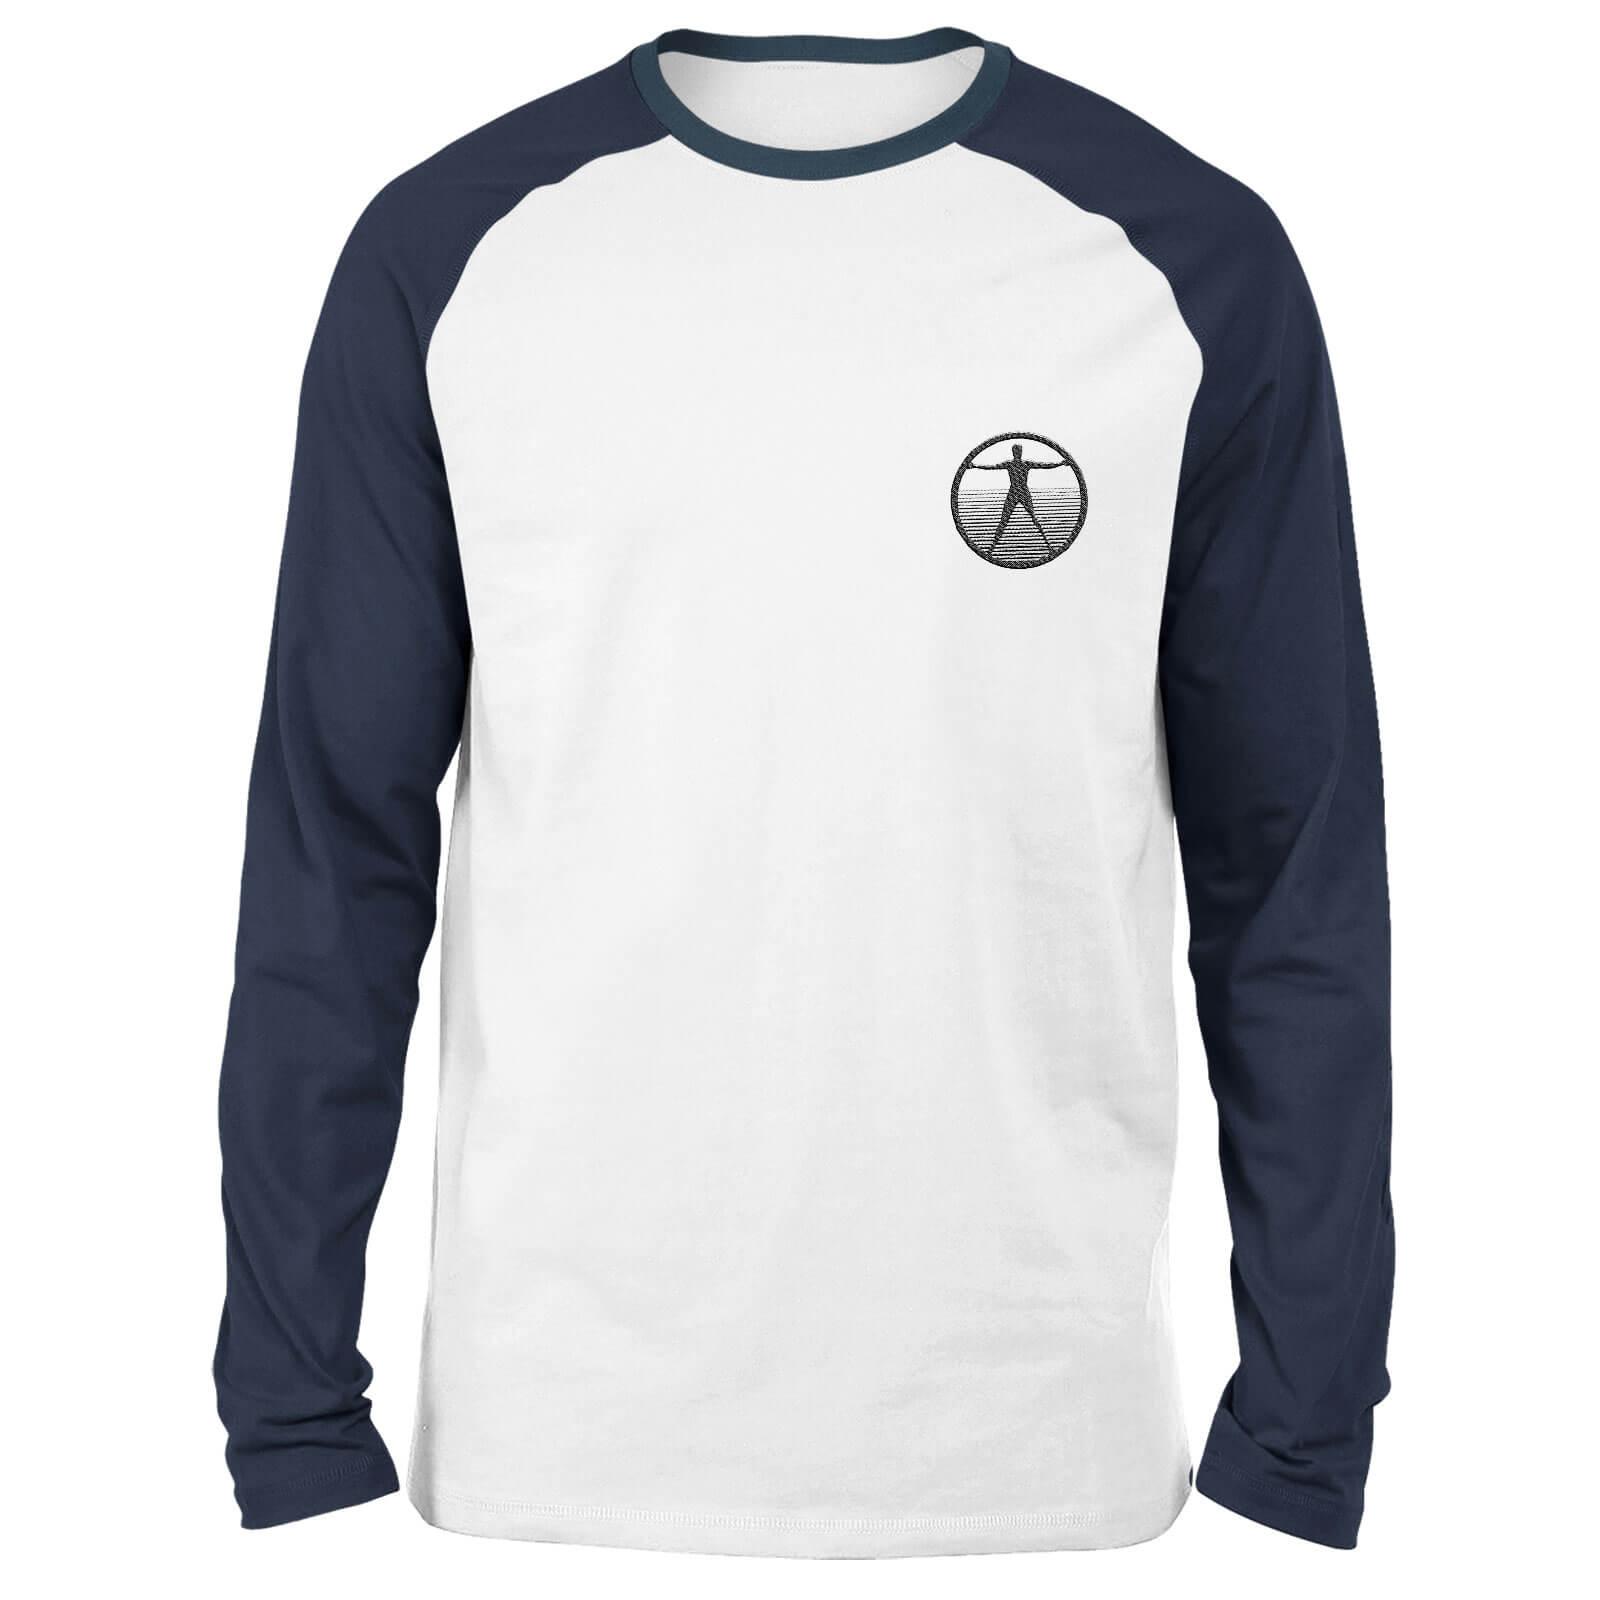 Westworld Logo Embroidered Unisex Long Sleeved Raglan T-Shirt - White/Navy - XL